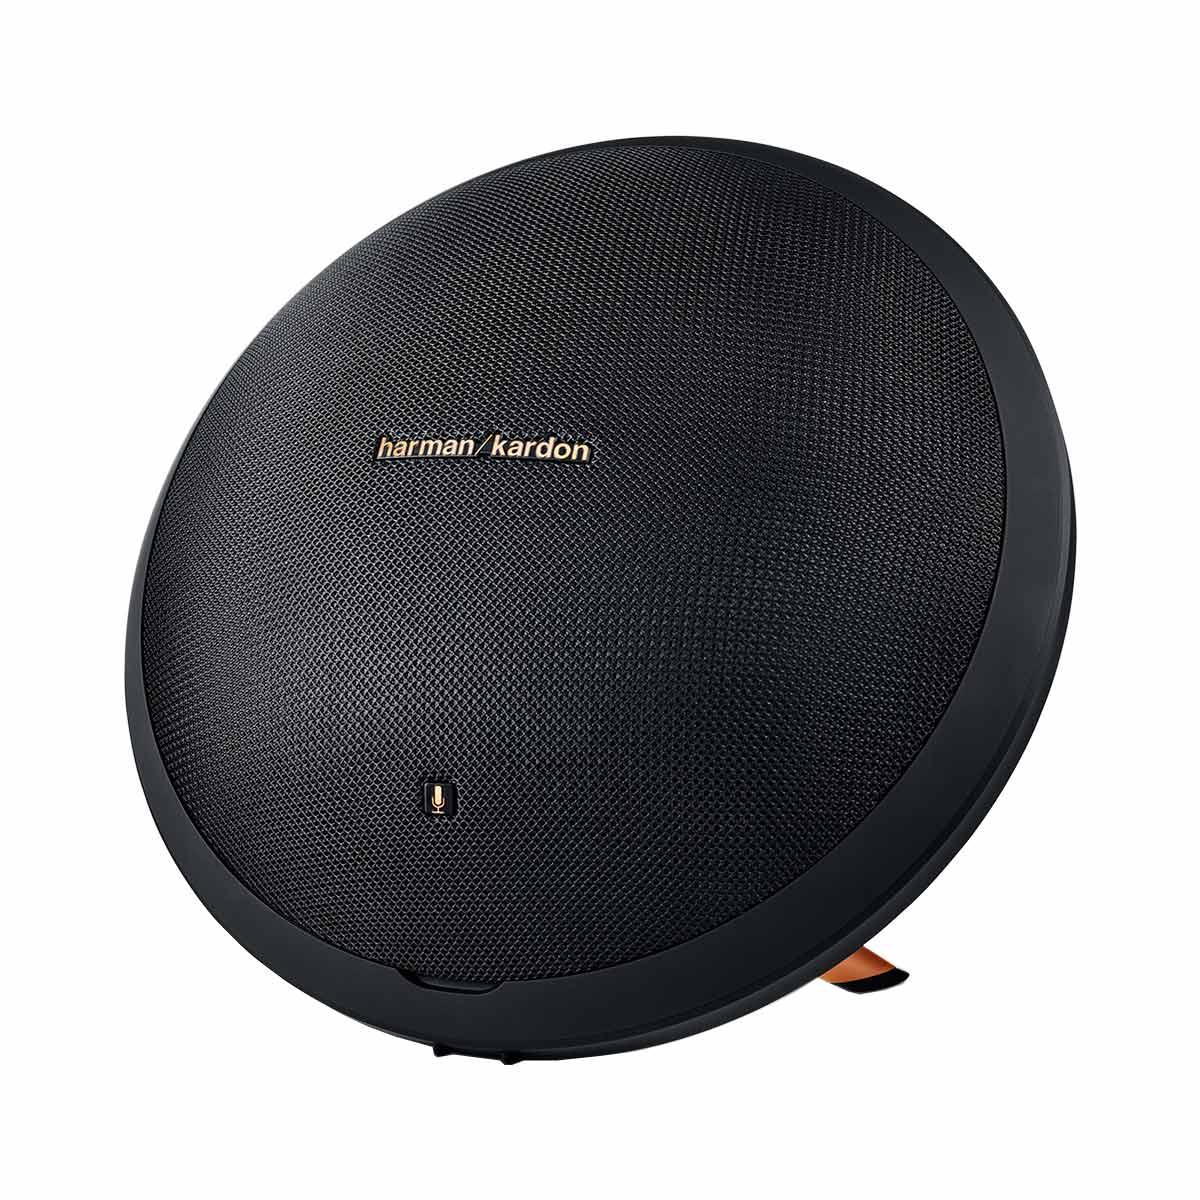 OnyxStudio2 - Caixa de Som Port�til 60W c/ Bluetooth Onyx Studio 2 - Kardon